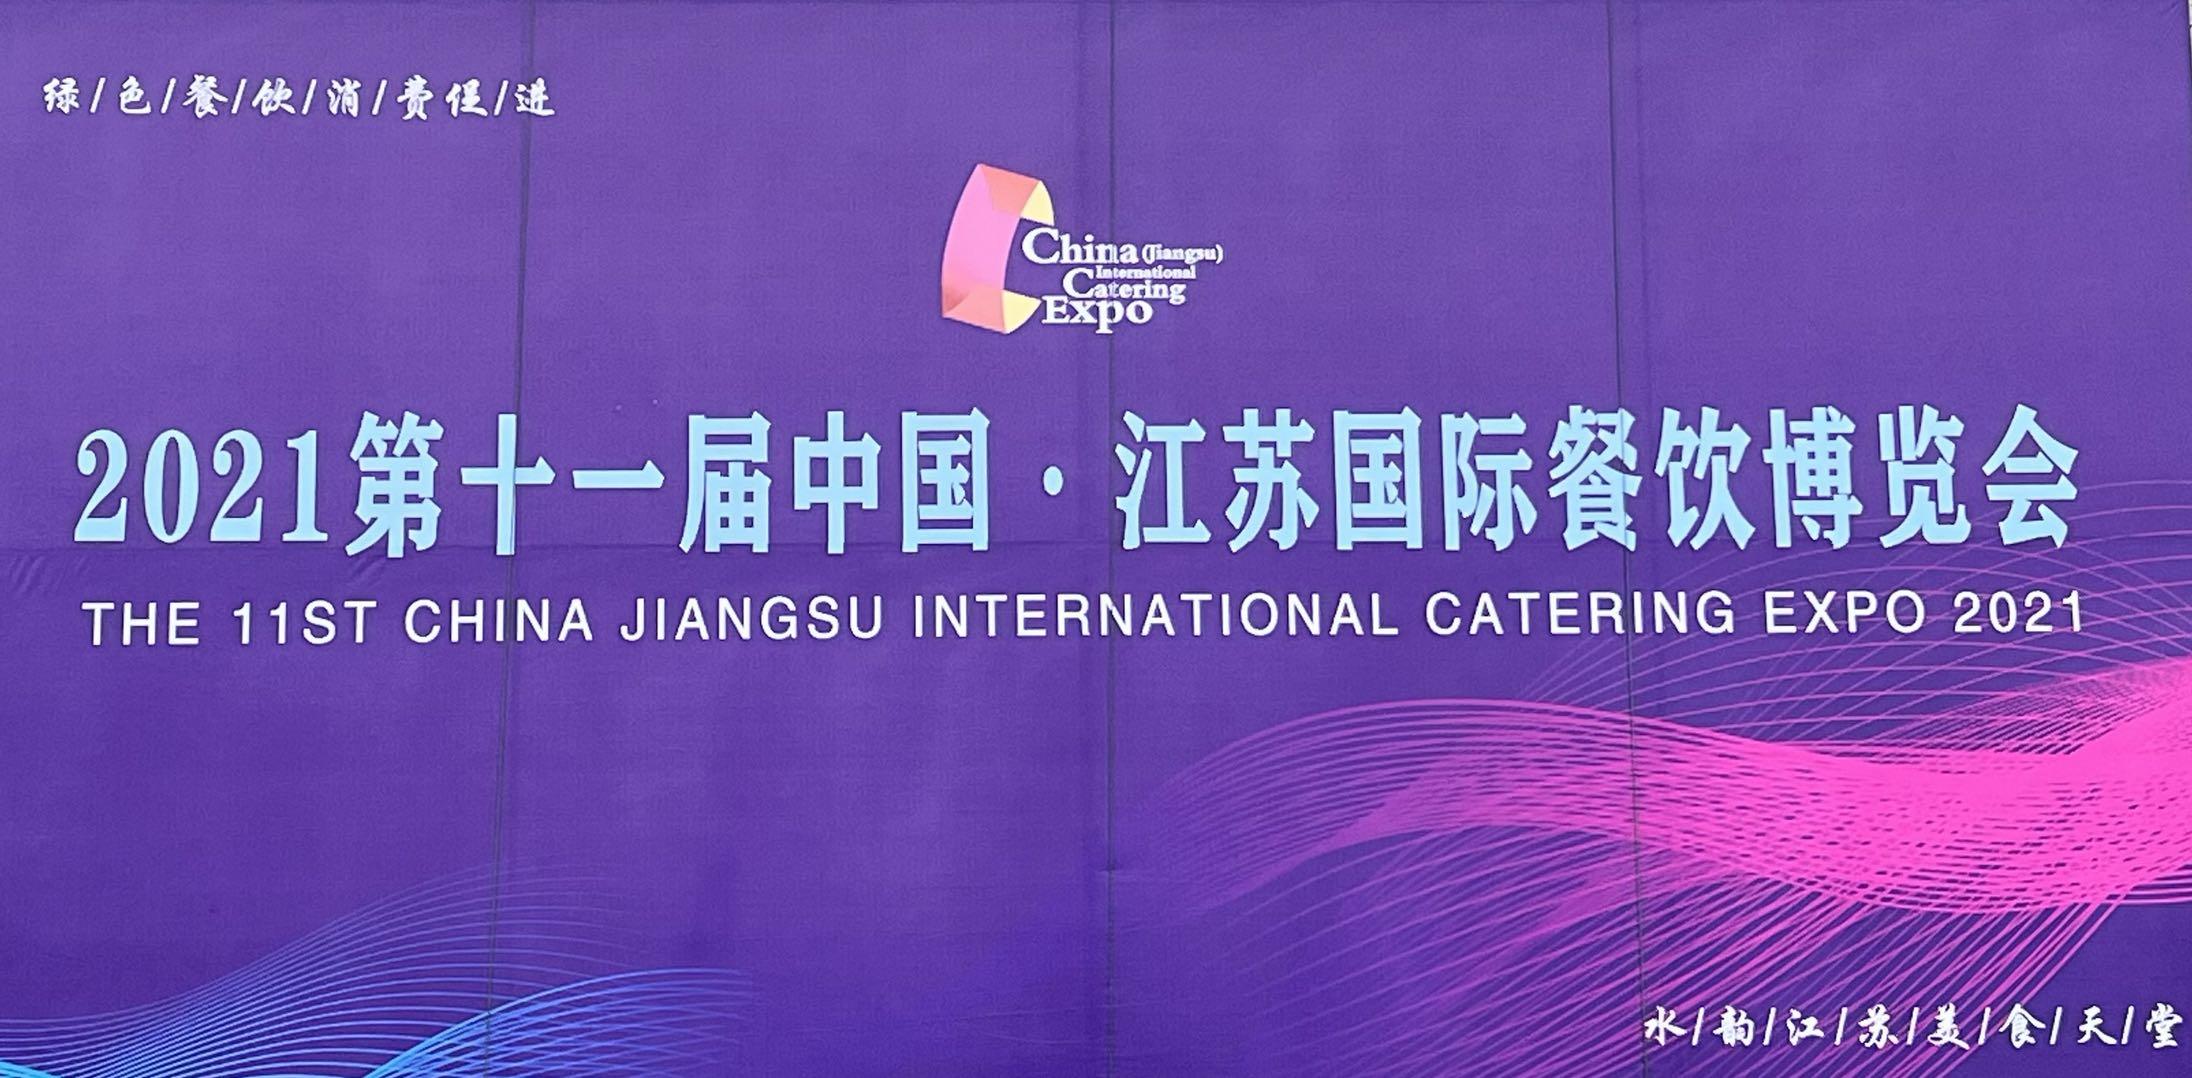 http://www.edaojz.cn/youxijingji/1043462.html